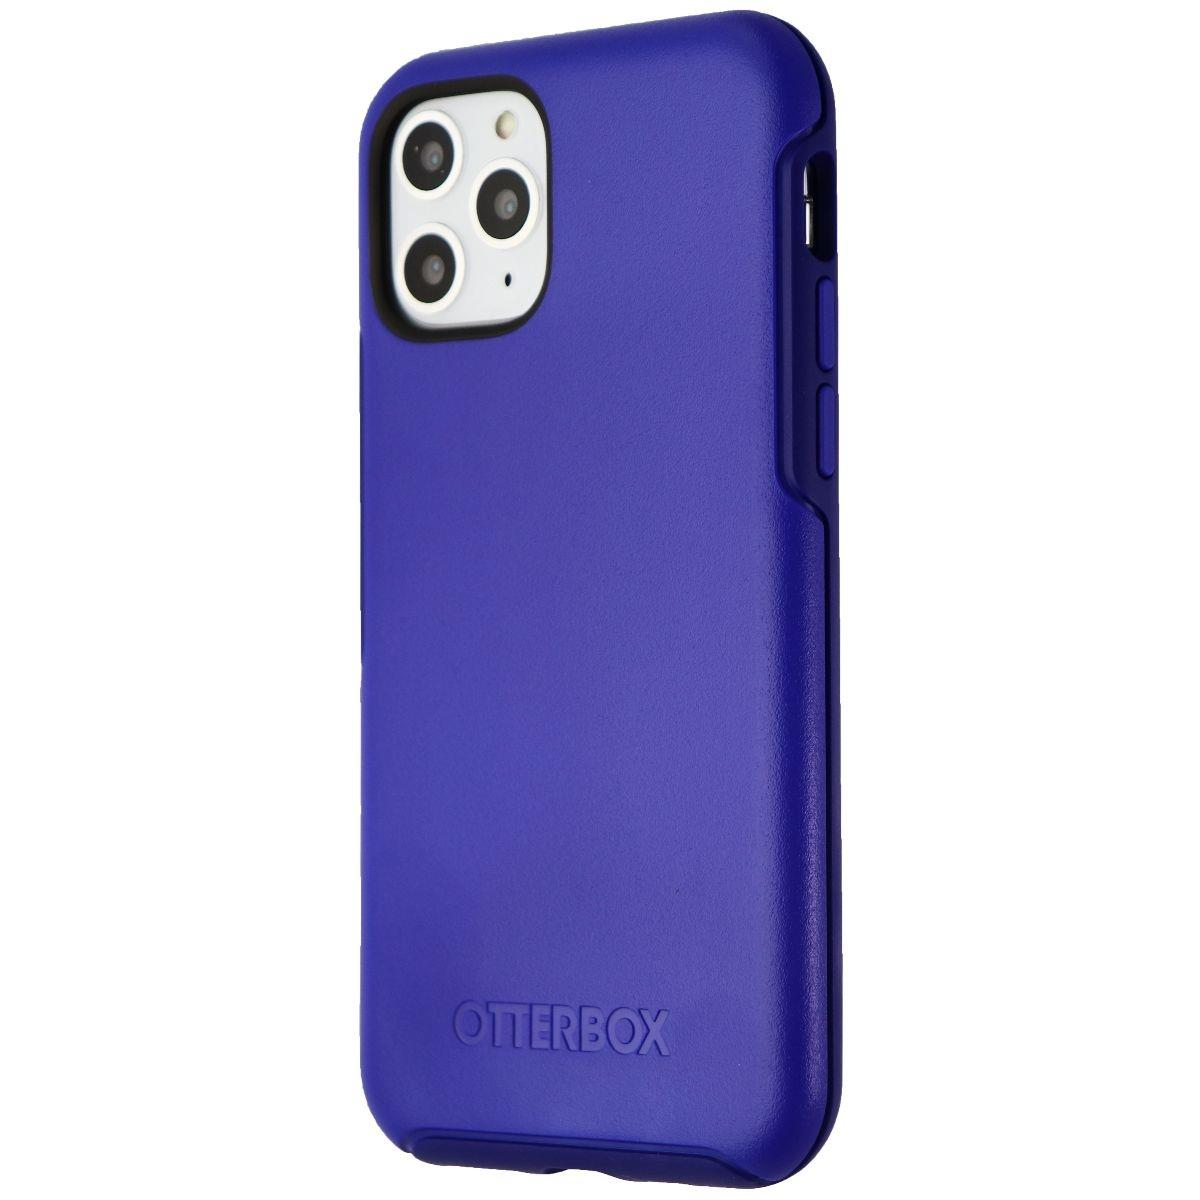 מגן חזק - Otterbox symmetry Apple iPhone 11 Pro כחול